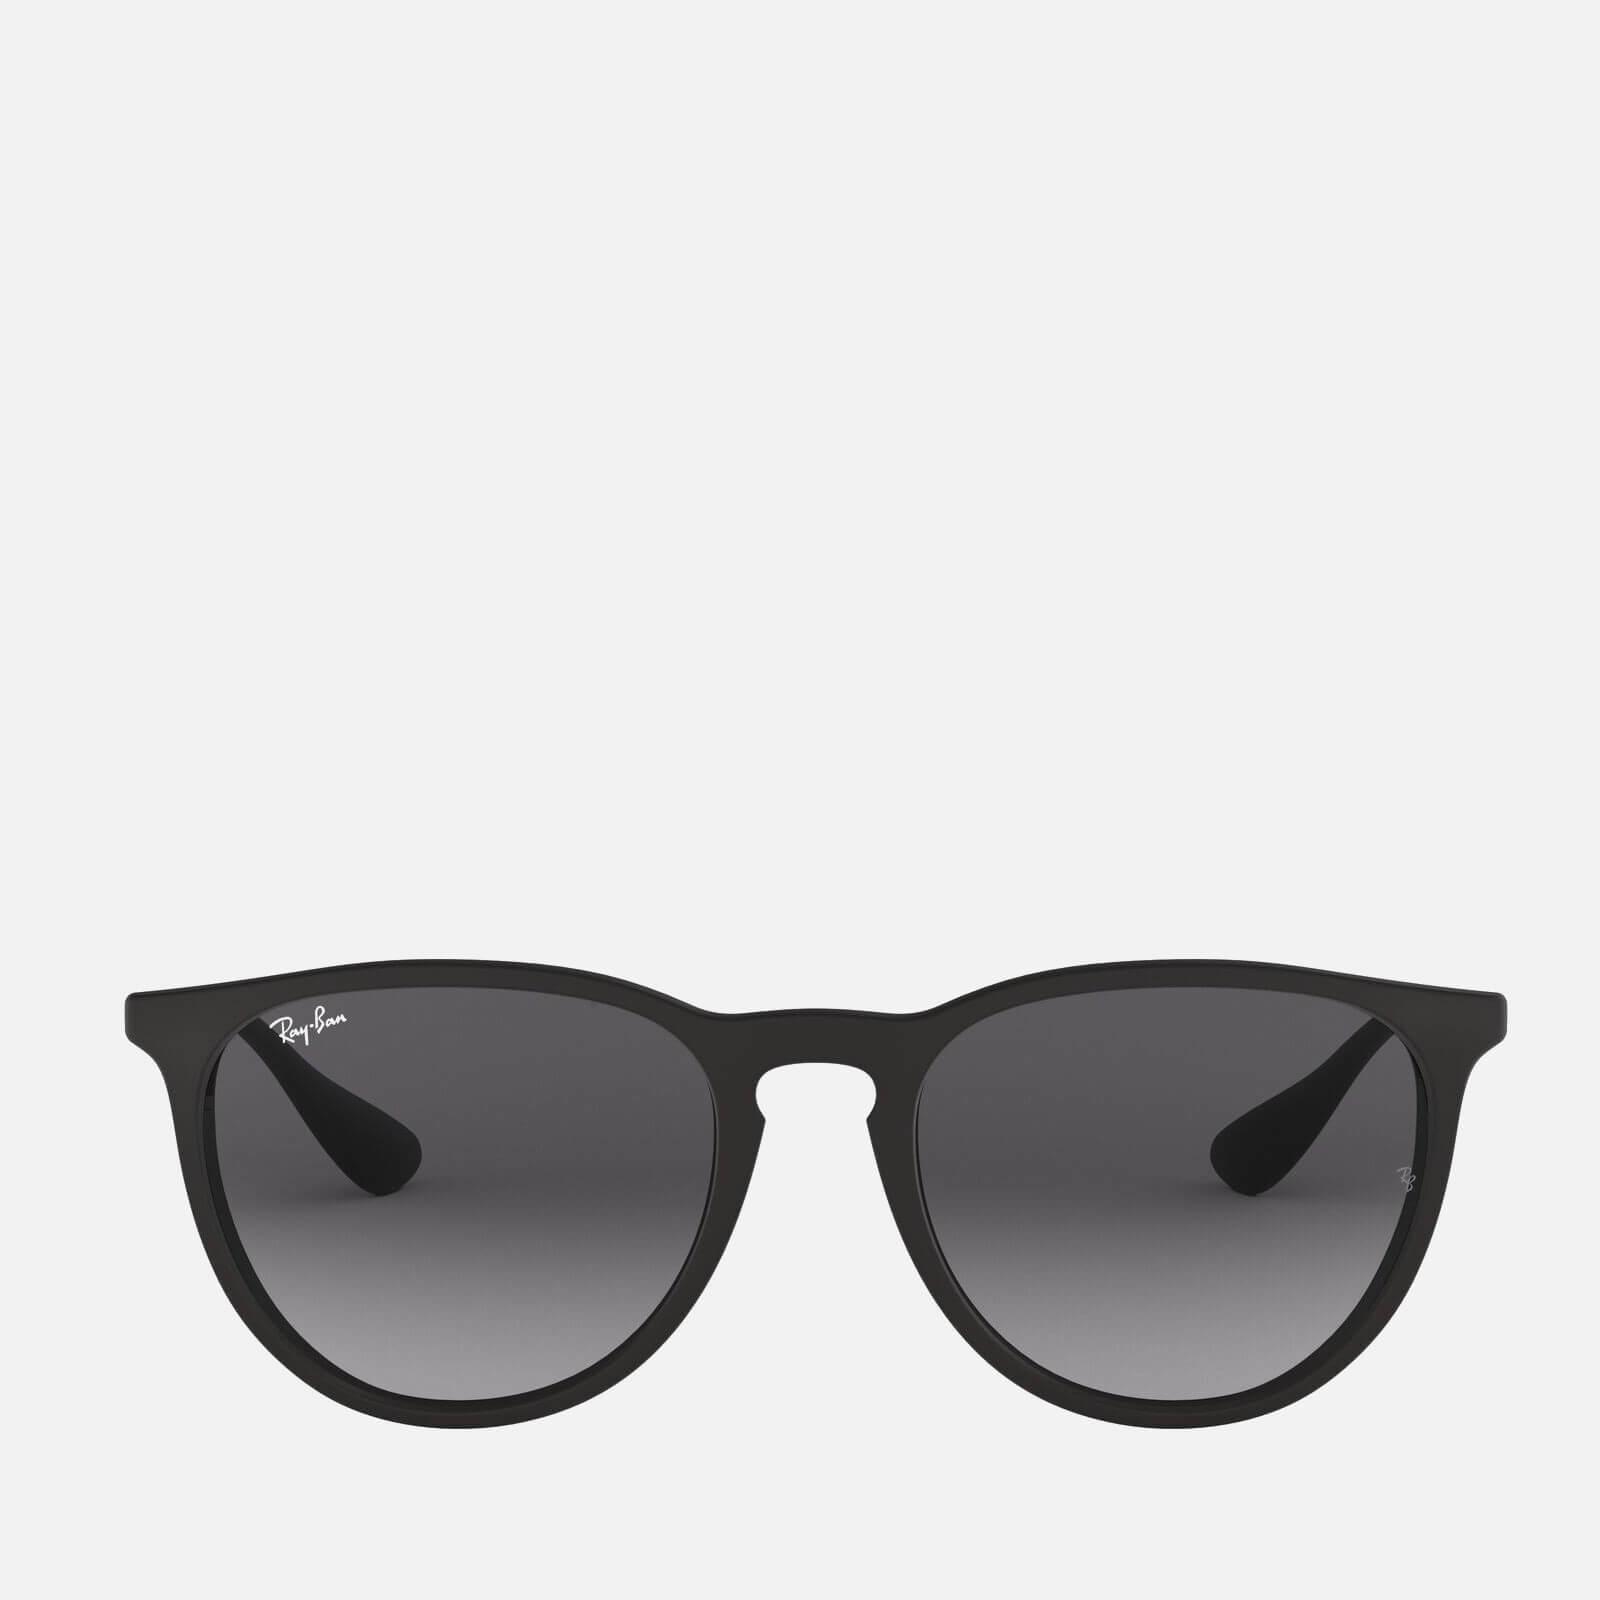 Ray-Ban Women's Erika Round Acetate Sunglasses - Black